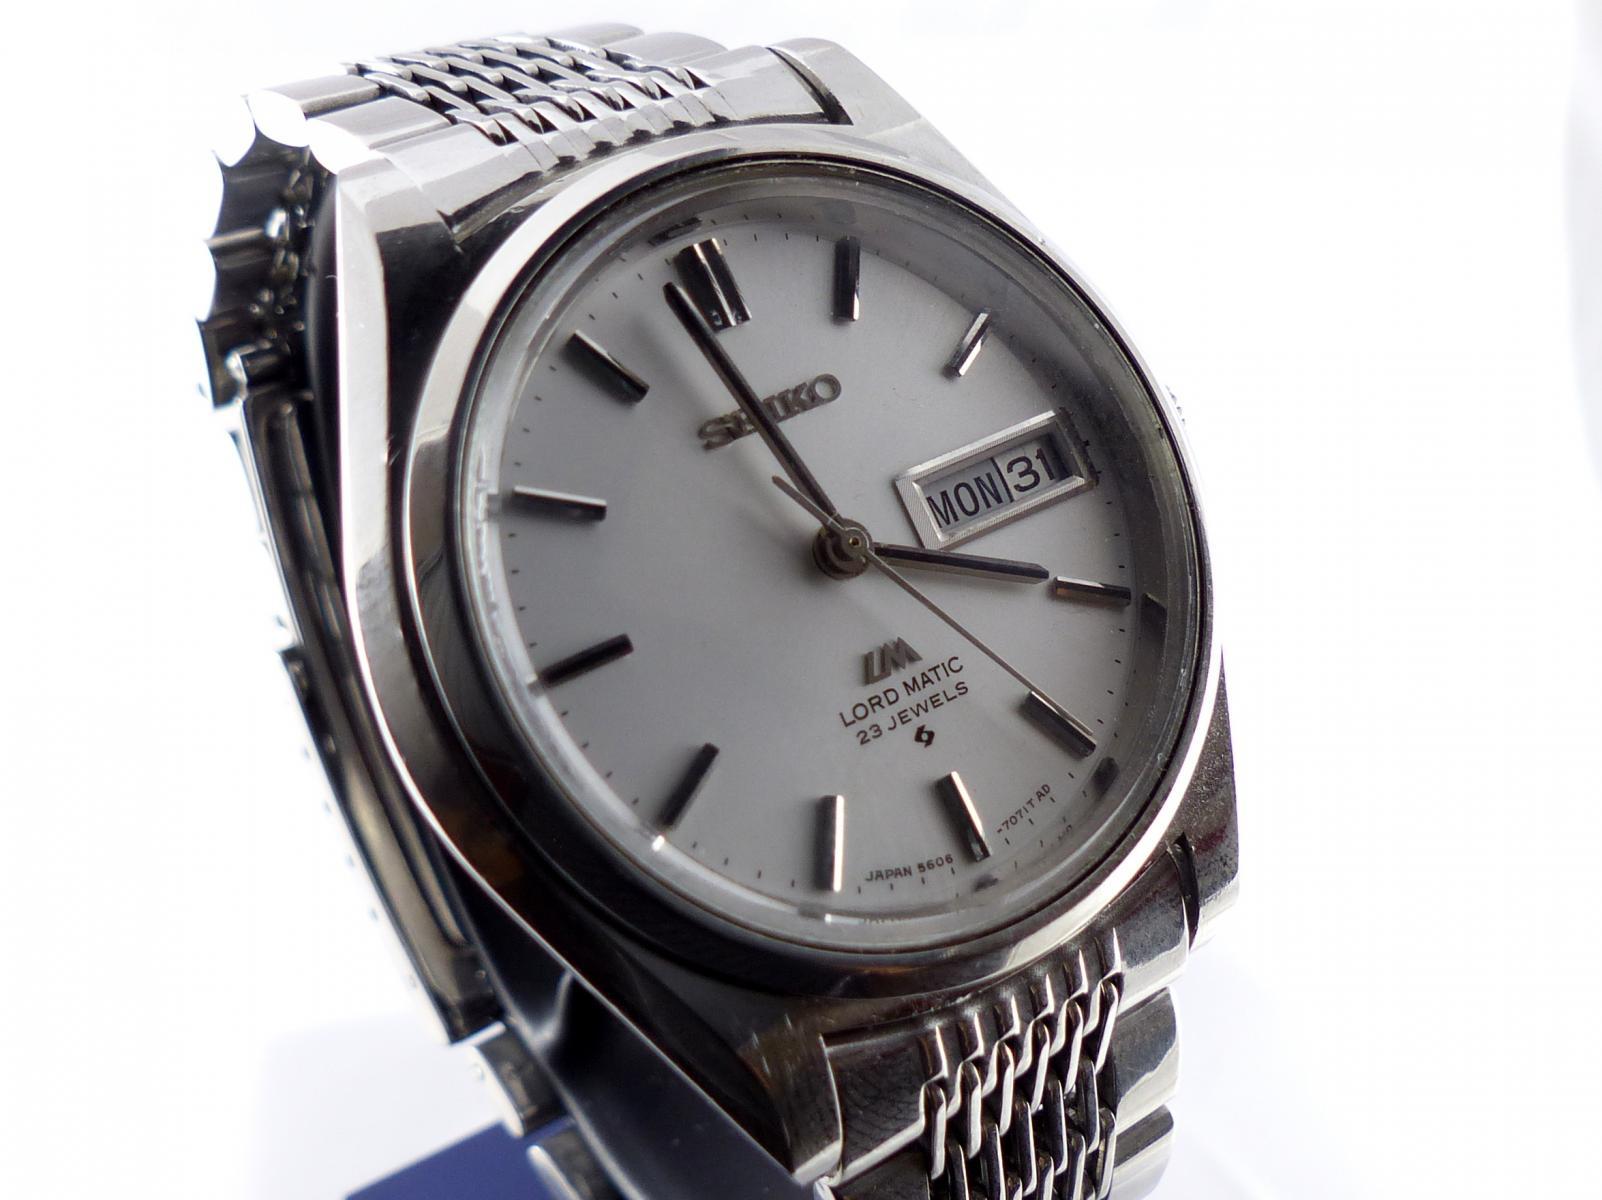 My Birthday Watch - 5606-p4860562.jpg